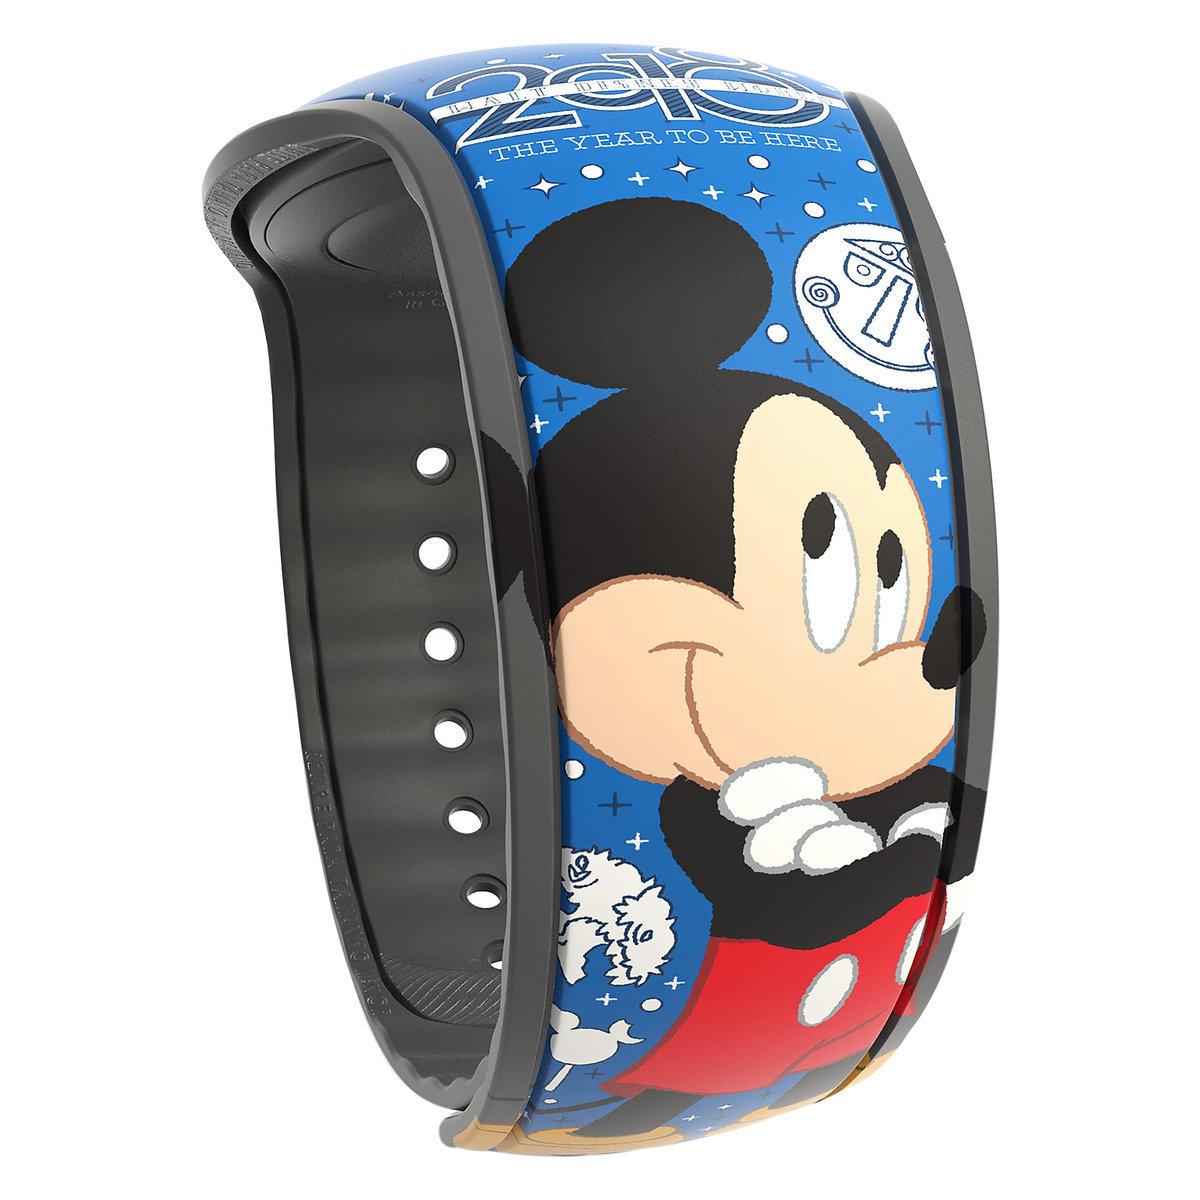 Disney Magicband 2 Bracelet 2018 Mickey Mouse Logo Wdw Store Icon Pin Circuit Board